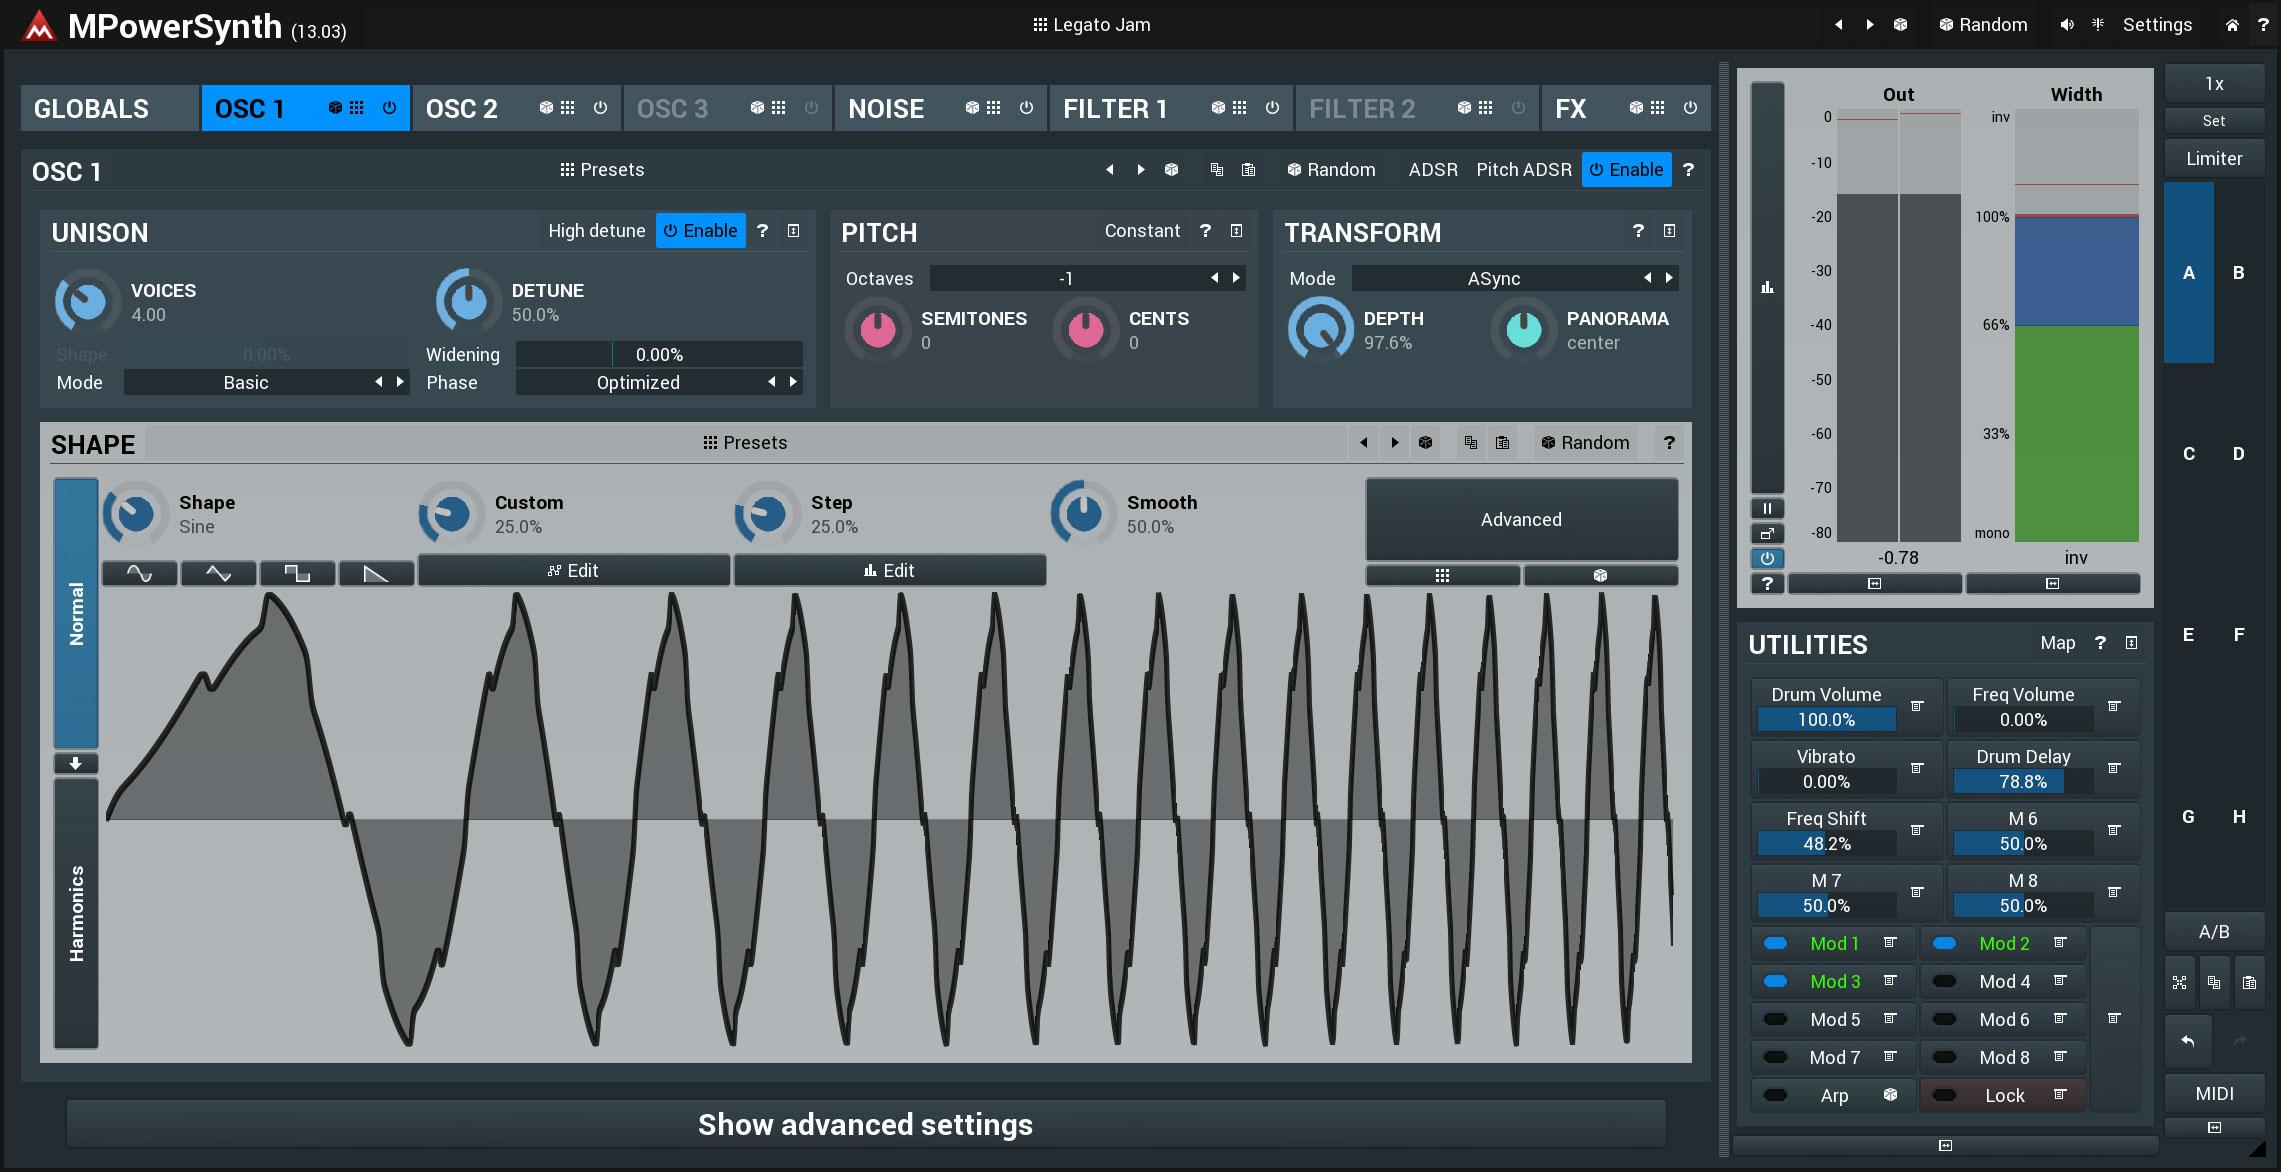 KVR: MPowerSynth by MeldaProduction - Synth (Hybrid) VST Plugin